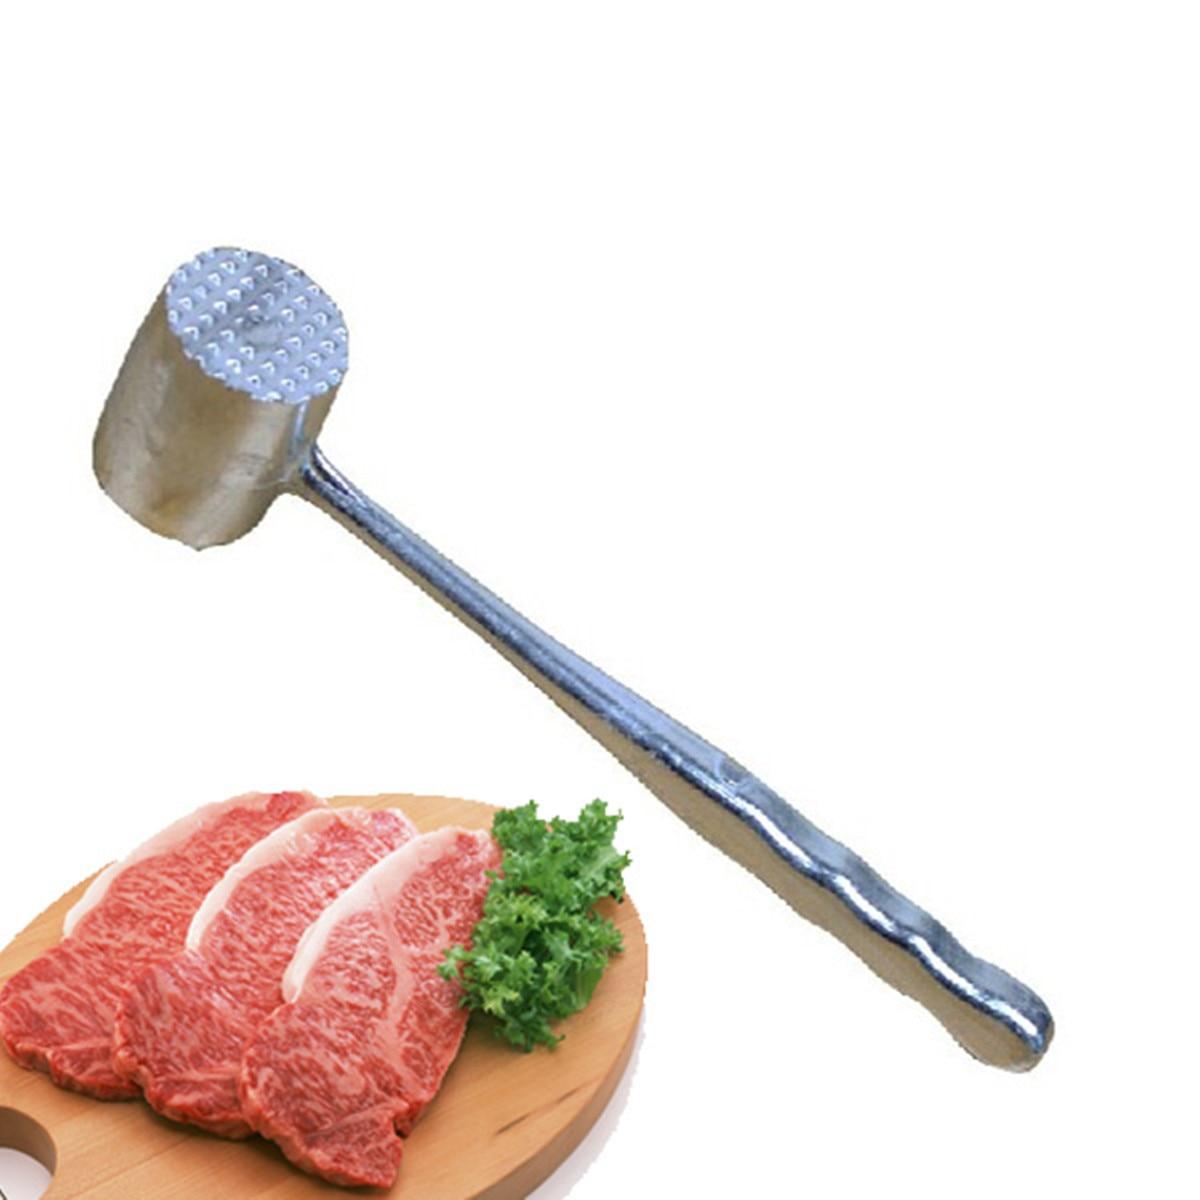 Steak Beef Hammer Aluminium Metal Meat Mallet Tenderizer Household User Friendly Gadgets Canteen